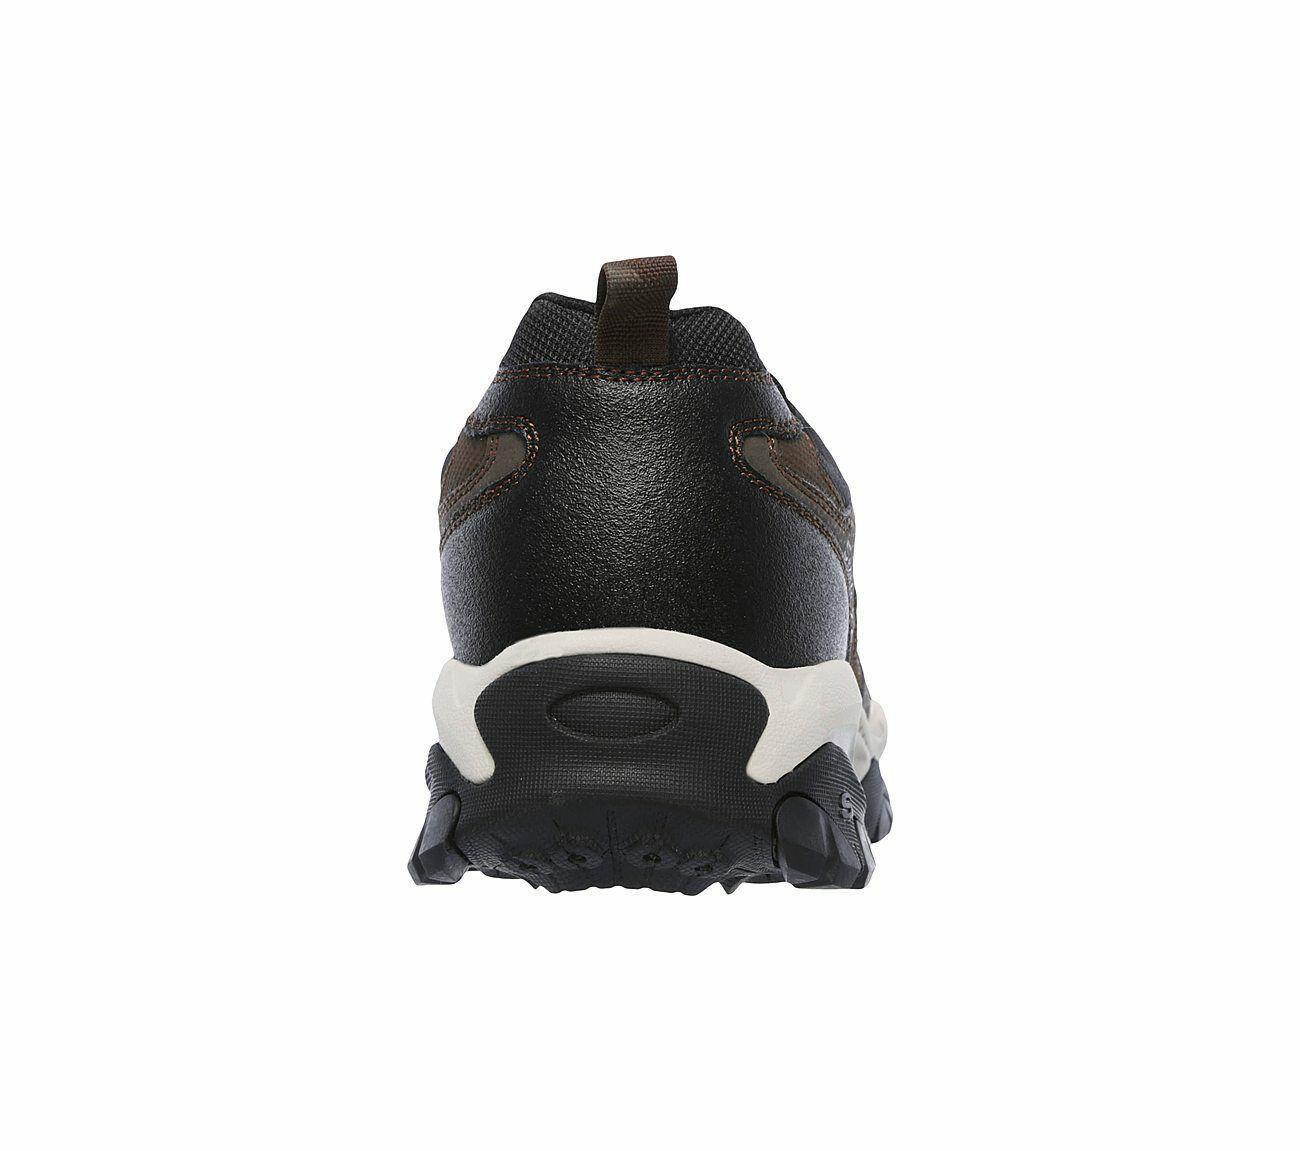 Skechers Wide Fit Brown shoes Men's Memory Foam Sport Train Comfort Casual 52700